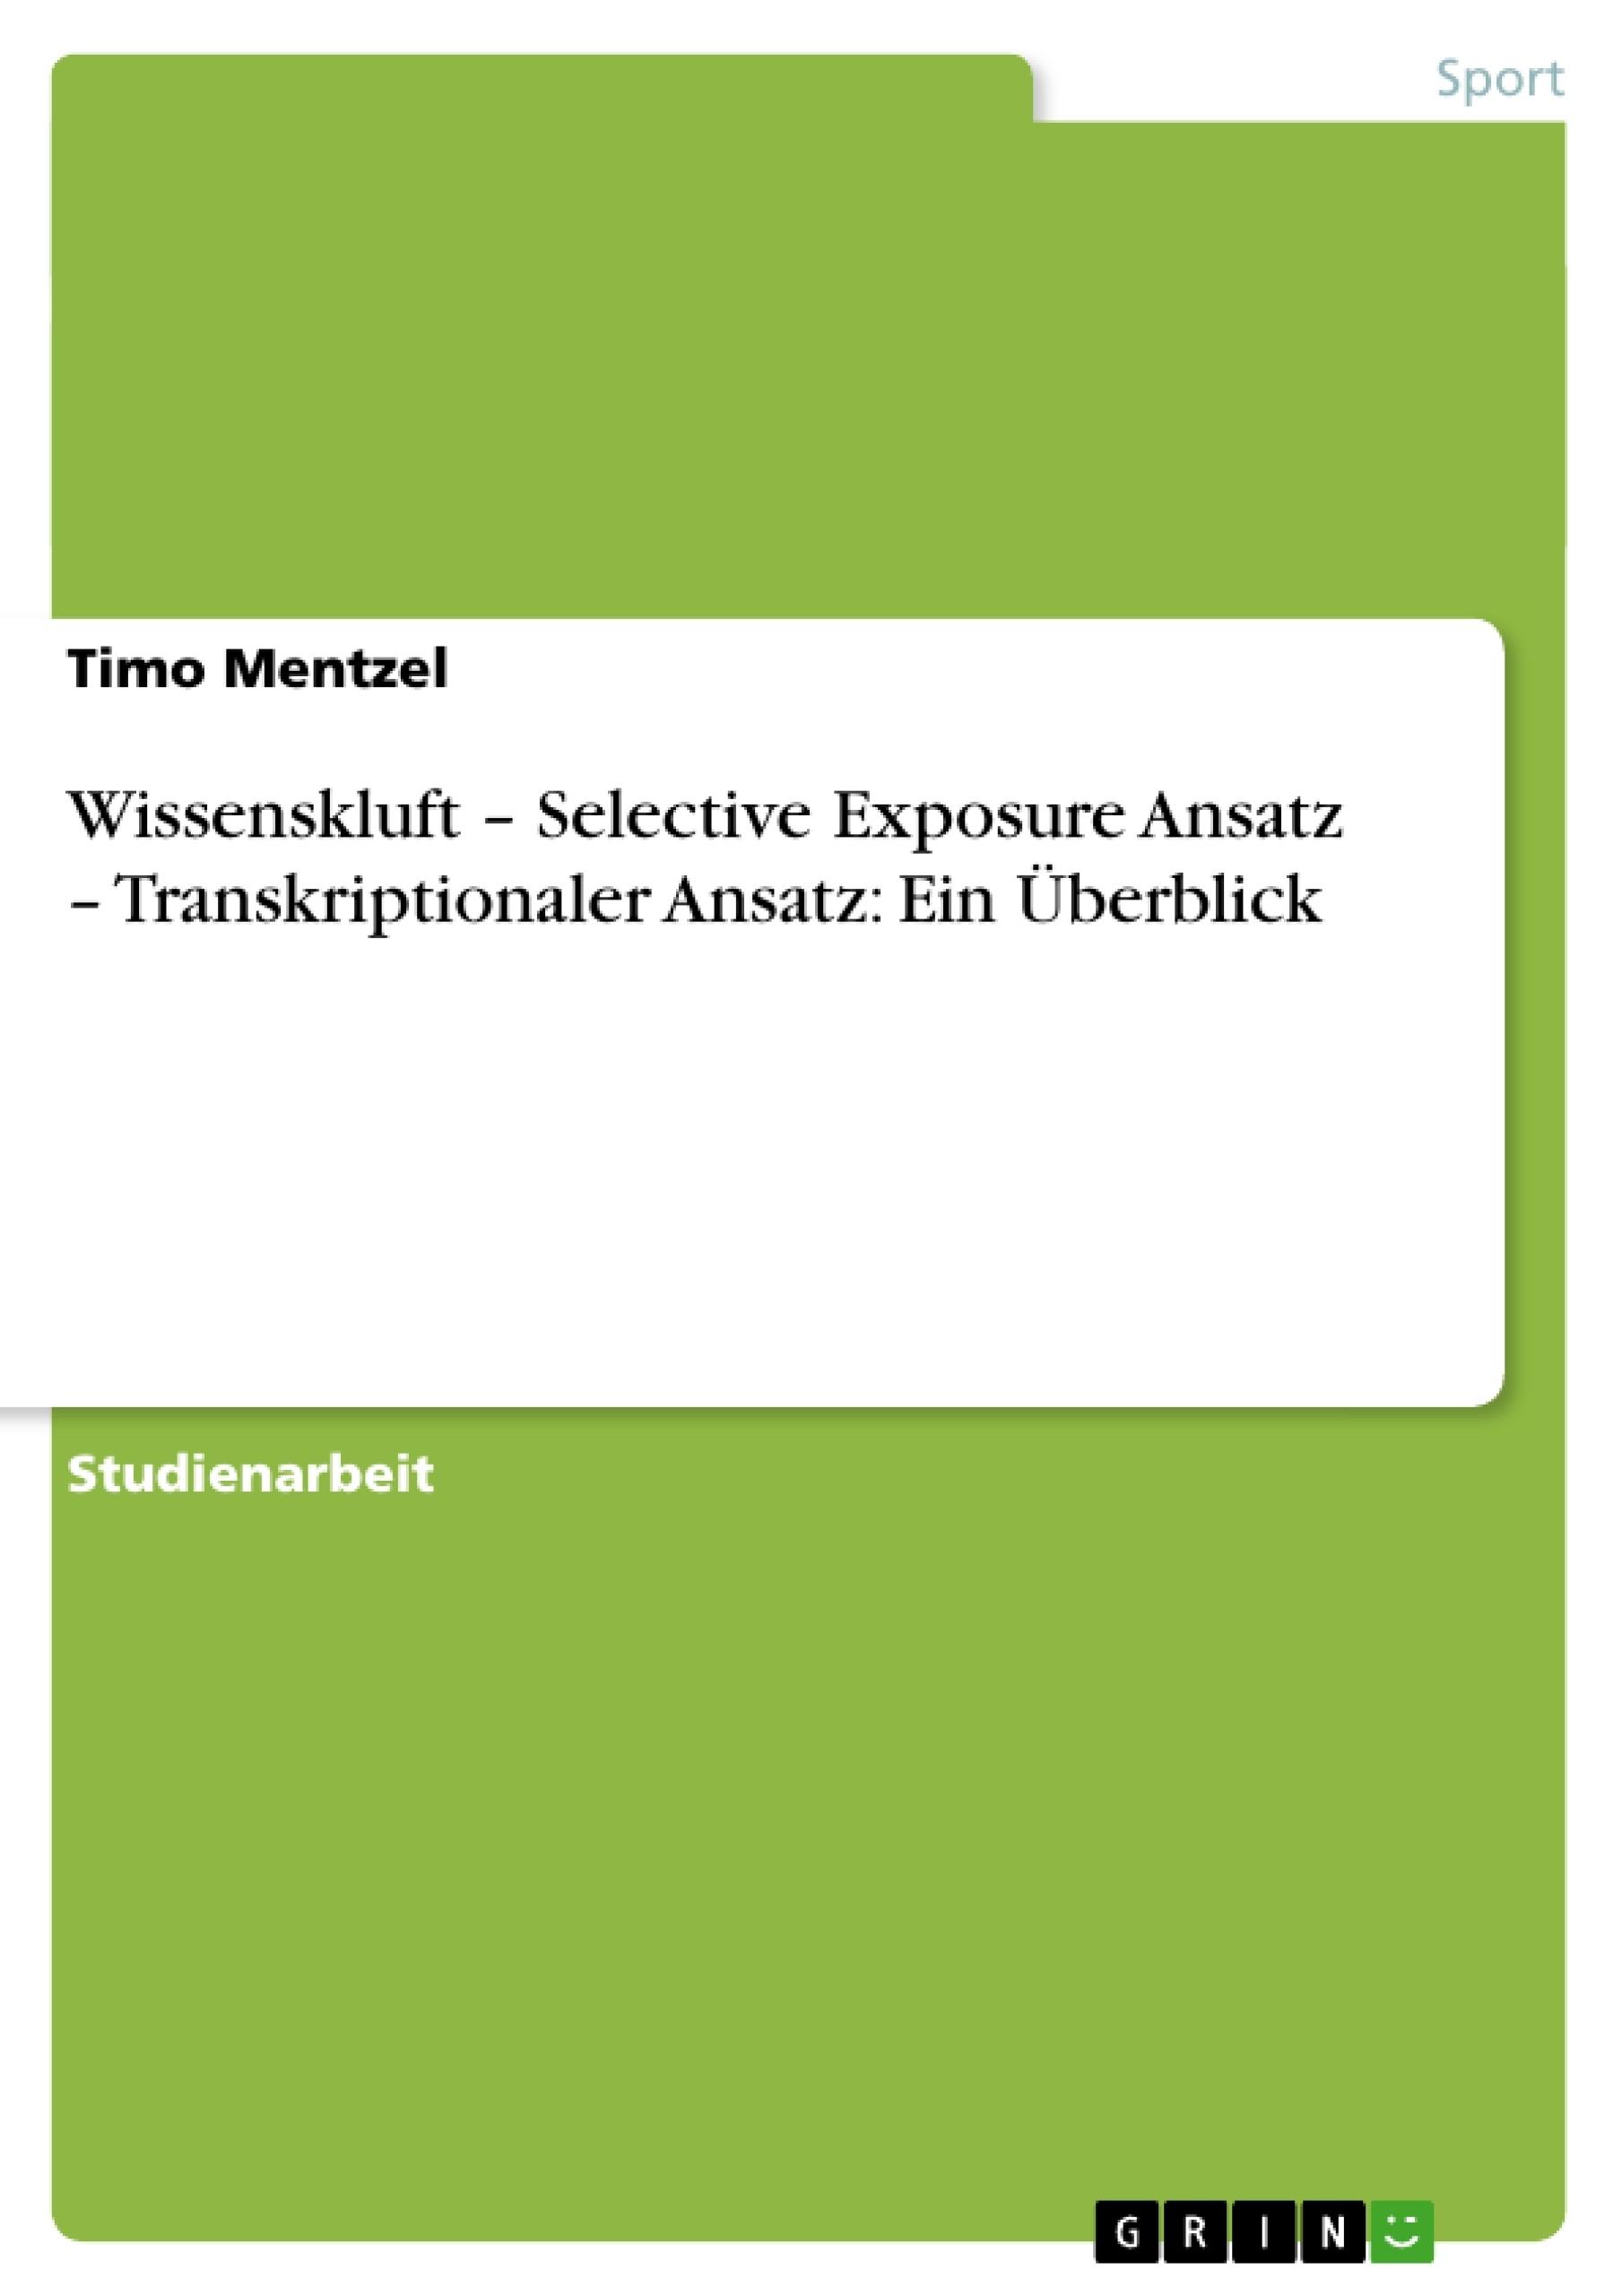 Titel: Wissenskluft – Selective Exposure Ansatz – Transkriptionaler Ansatz: Ein Überblick